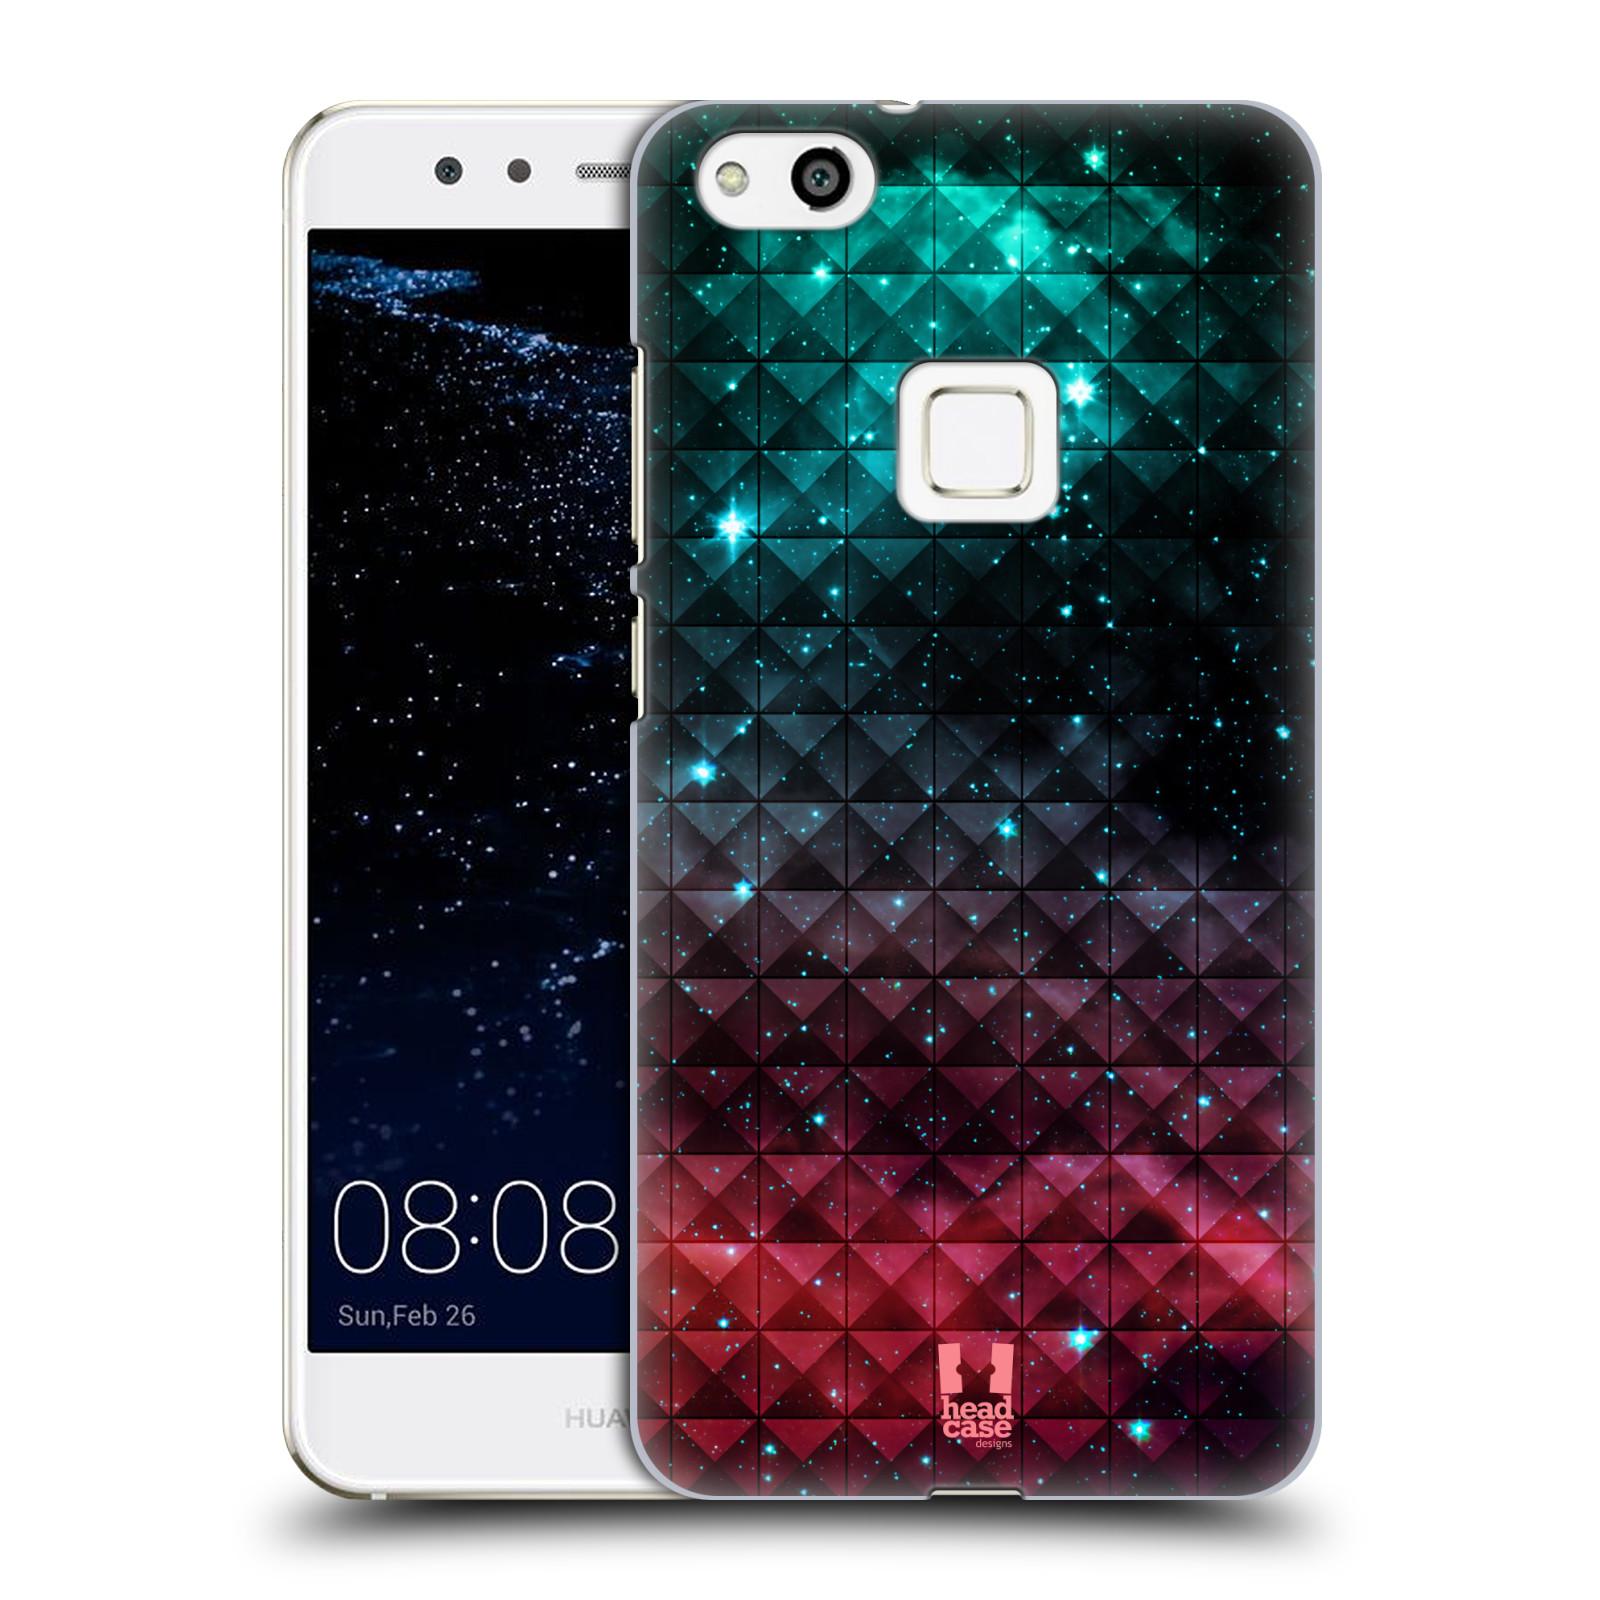 Plastové pouzdro na mobil Huawei P10 Lite Head Case - OMBRE SPARKLE (Plastový kryt či obal na mobilní telefon Huawei P10 Lite Dual SIM (LX1/LX1A))